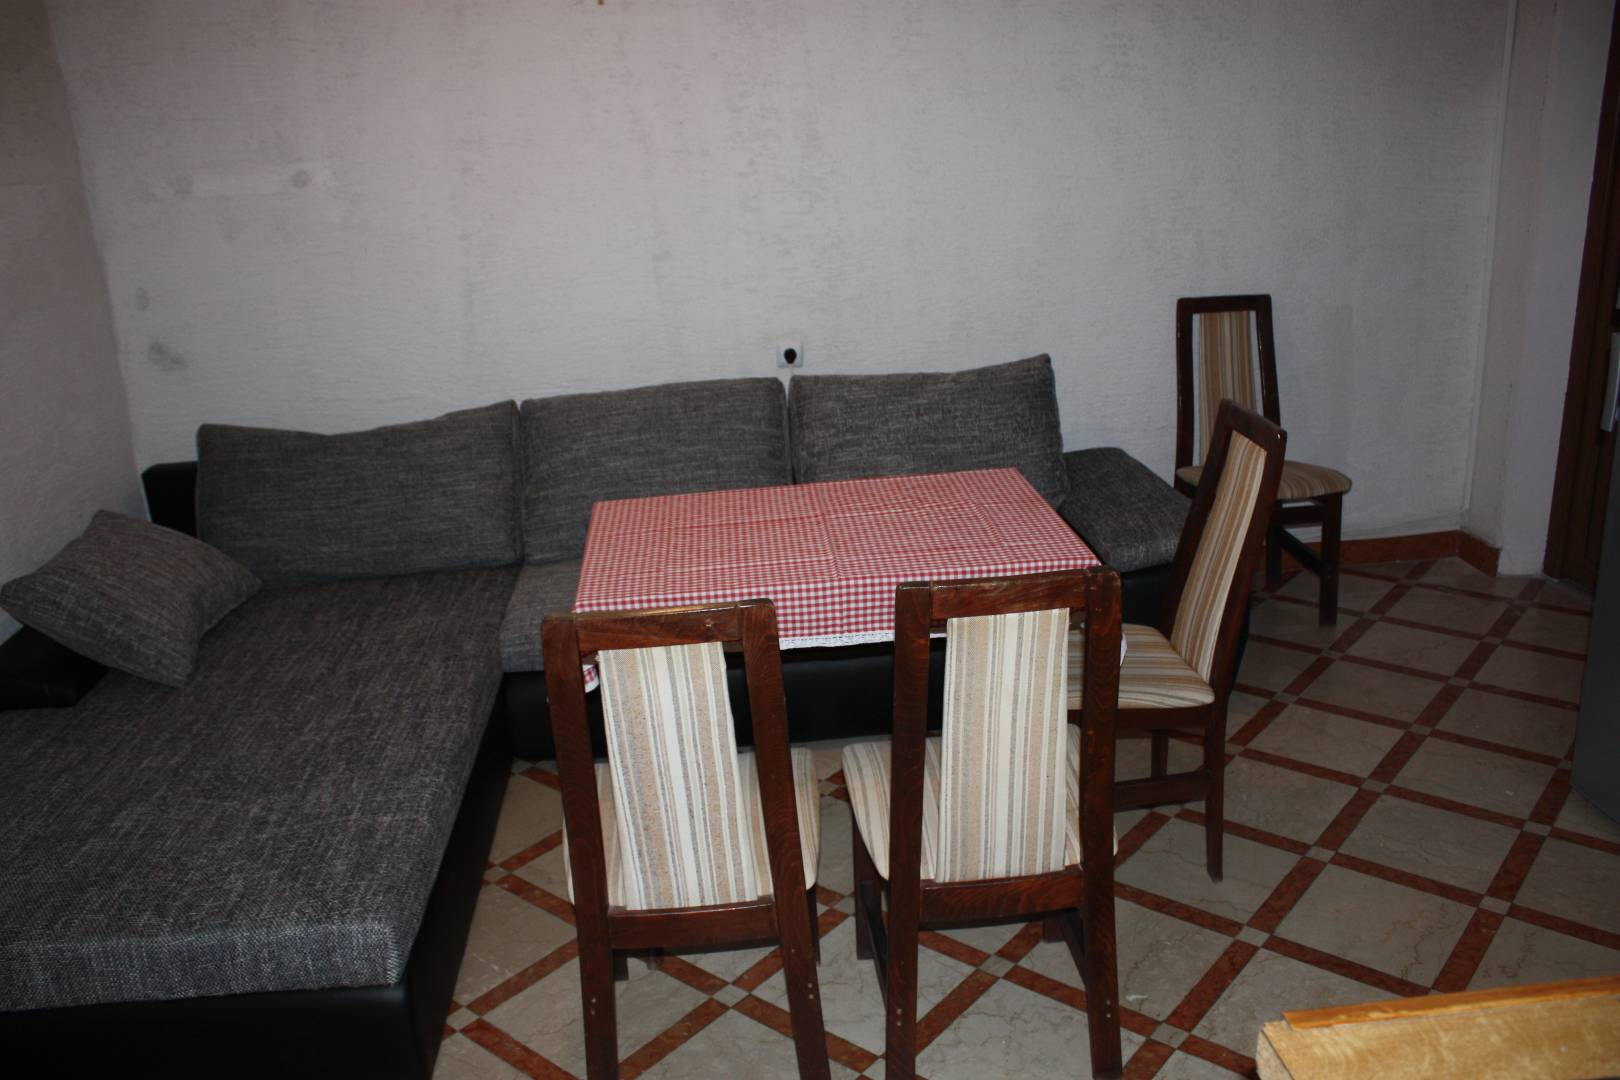 IMG 9442 - Wohnunh Kornati